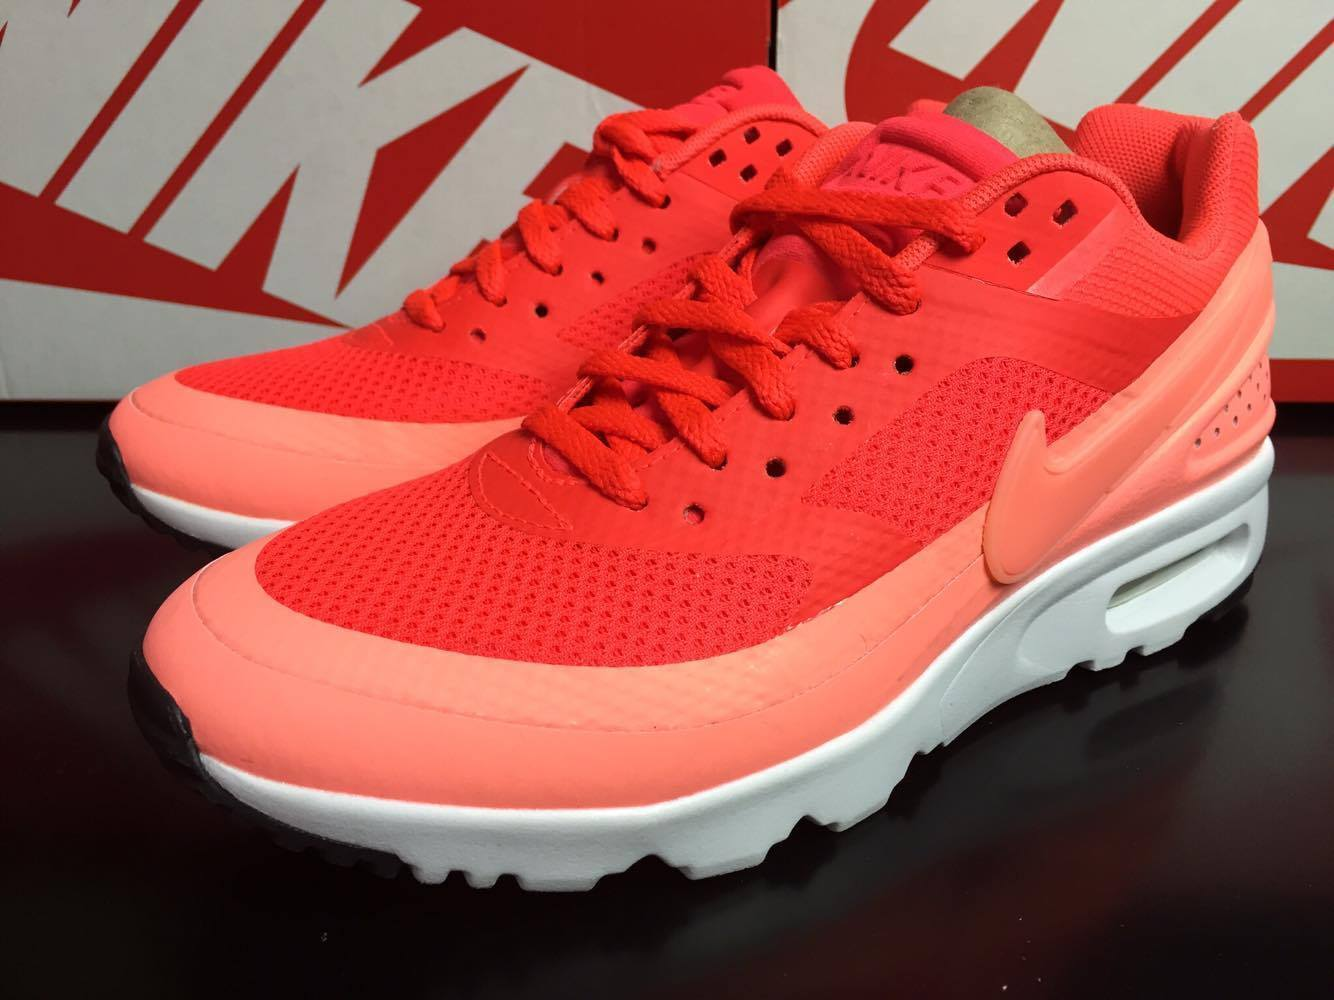 NIKE Femme fonctionnement Air Max BW Ultra fonctionnement Femme chaussures Bright Crimson 819638 600 fdb507